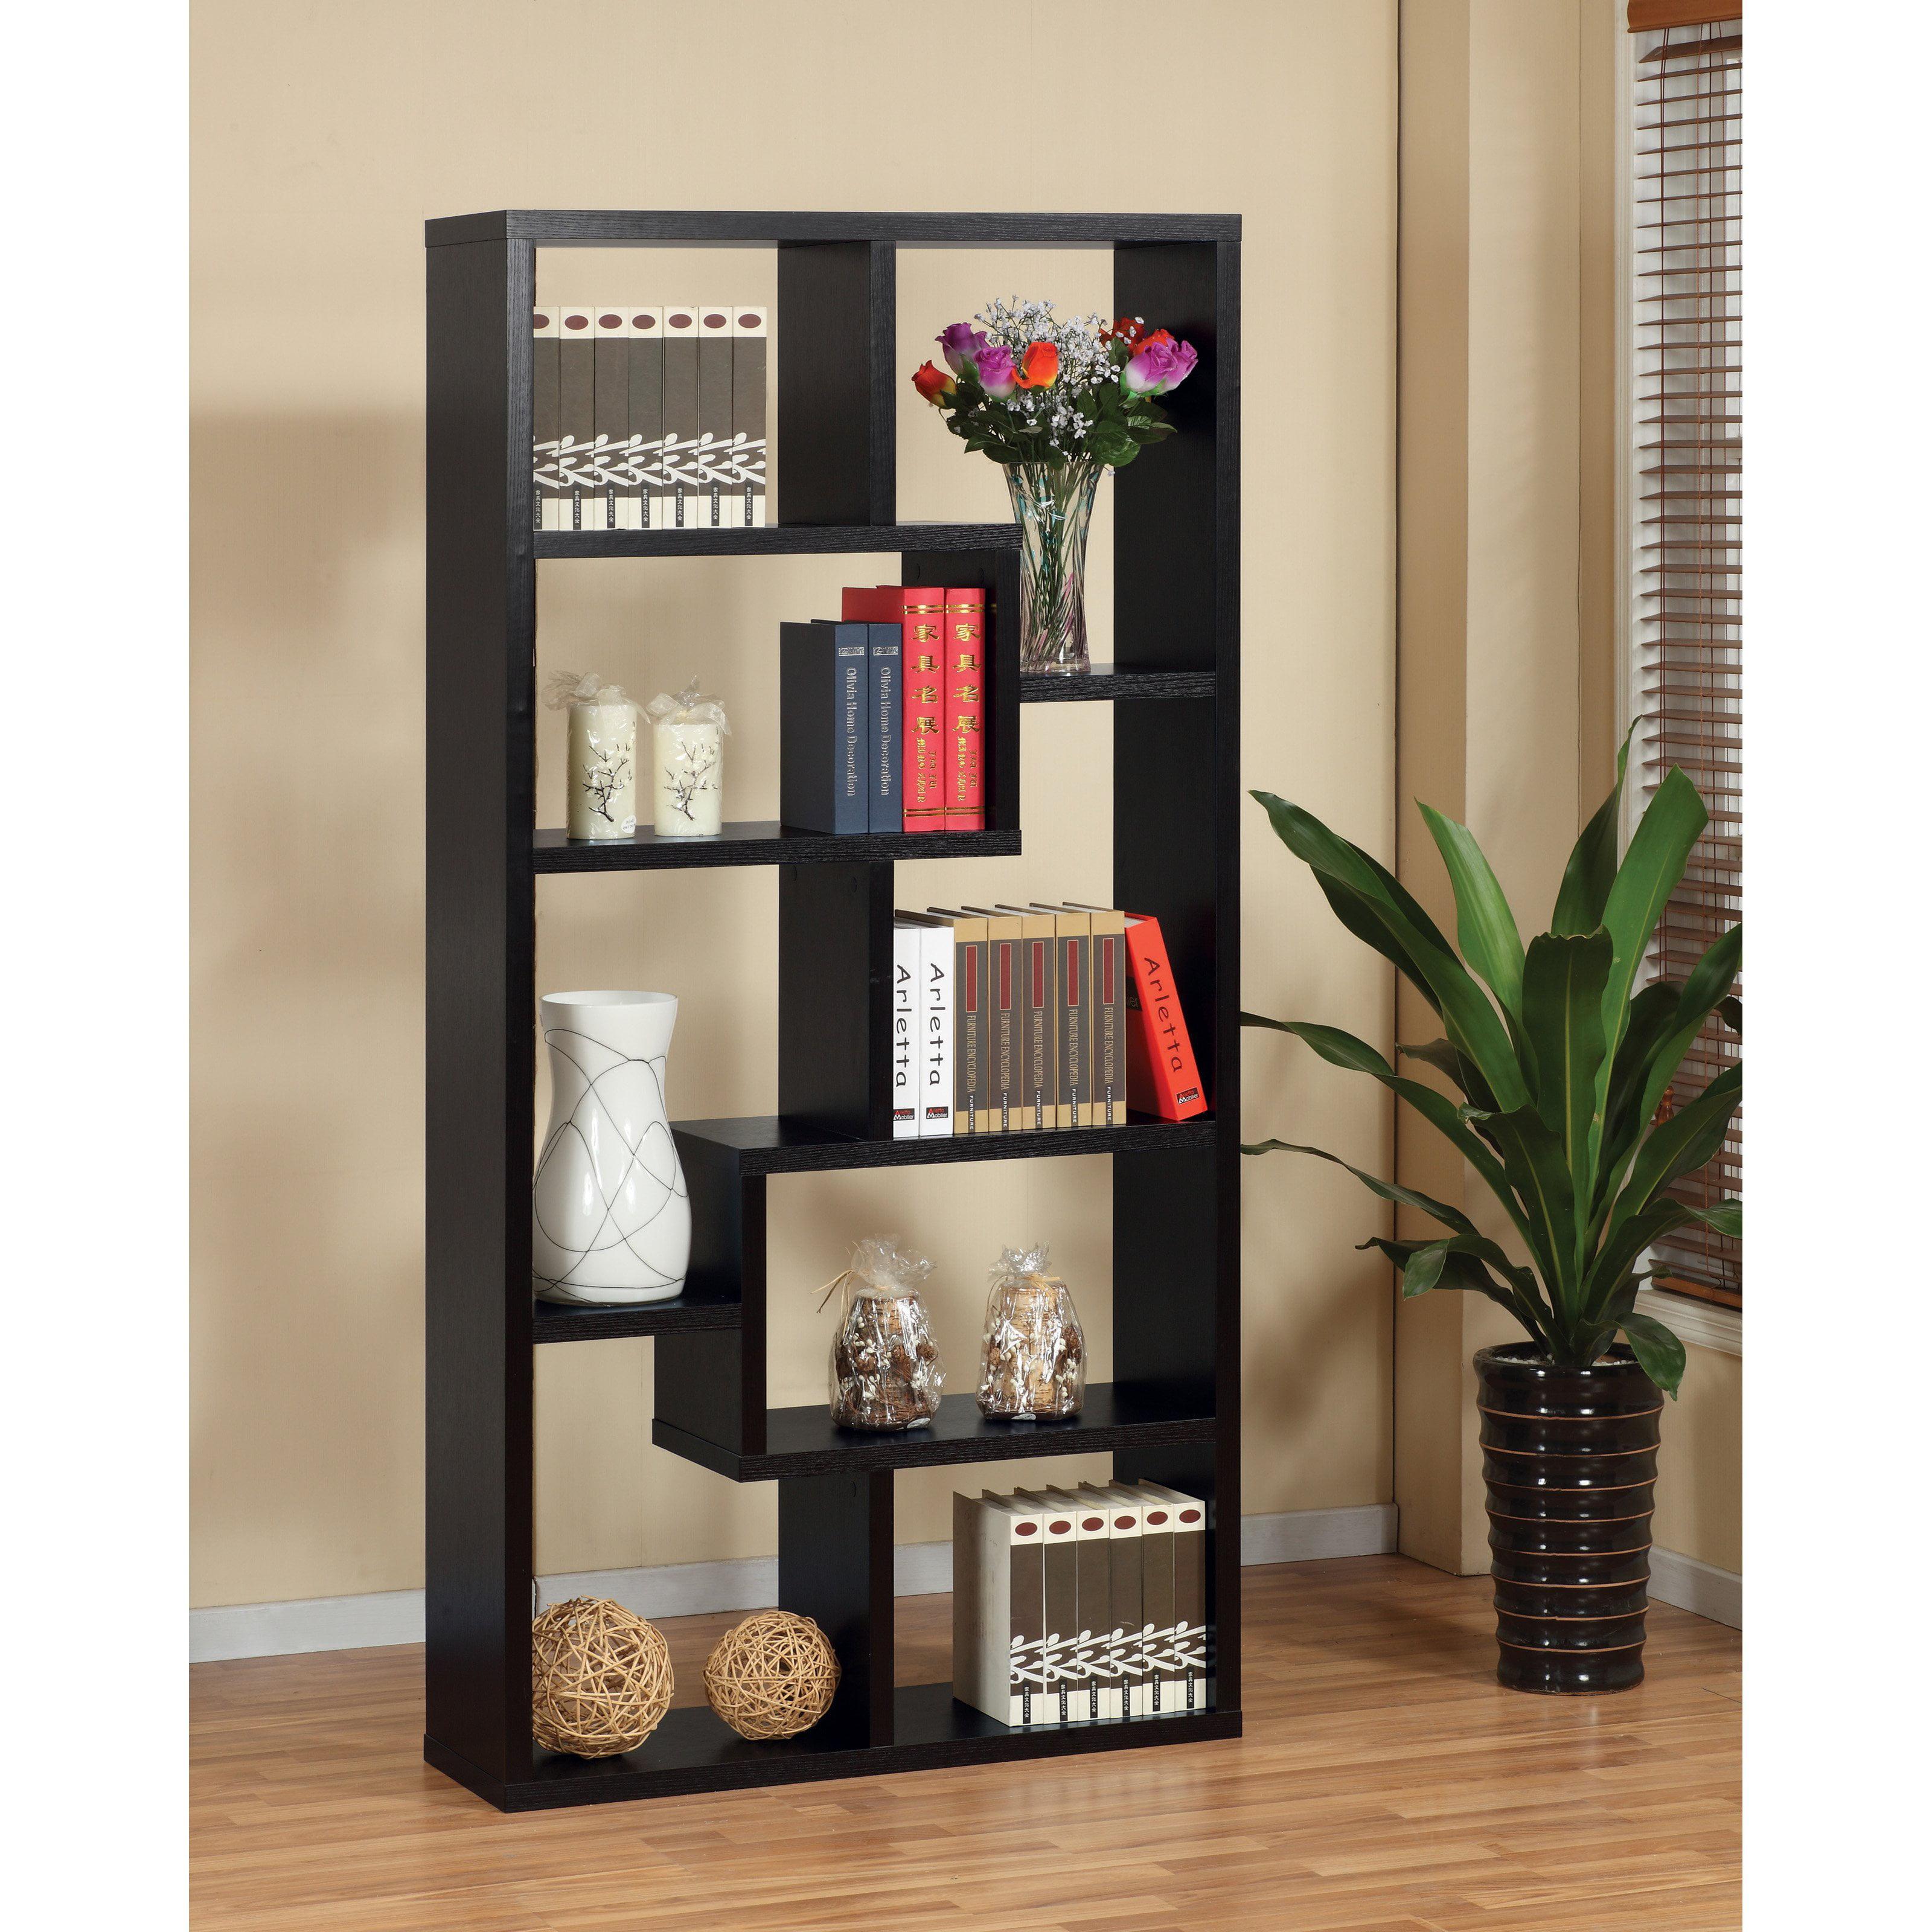 Decorative Display Cases Furniture Of America Verena Contoured Leveled Display Cabinet